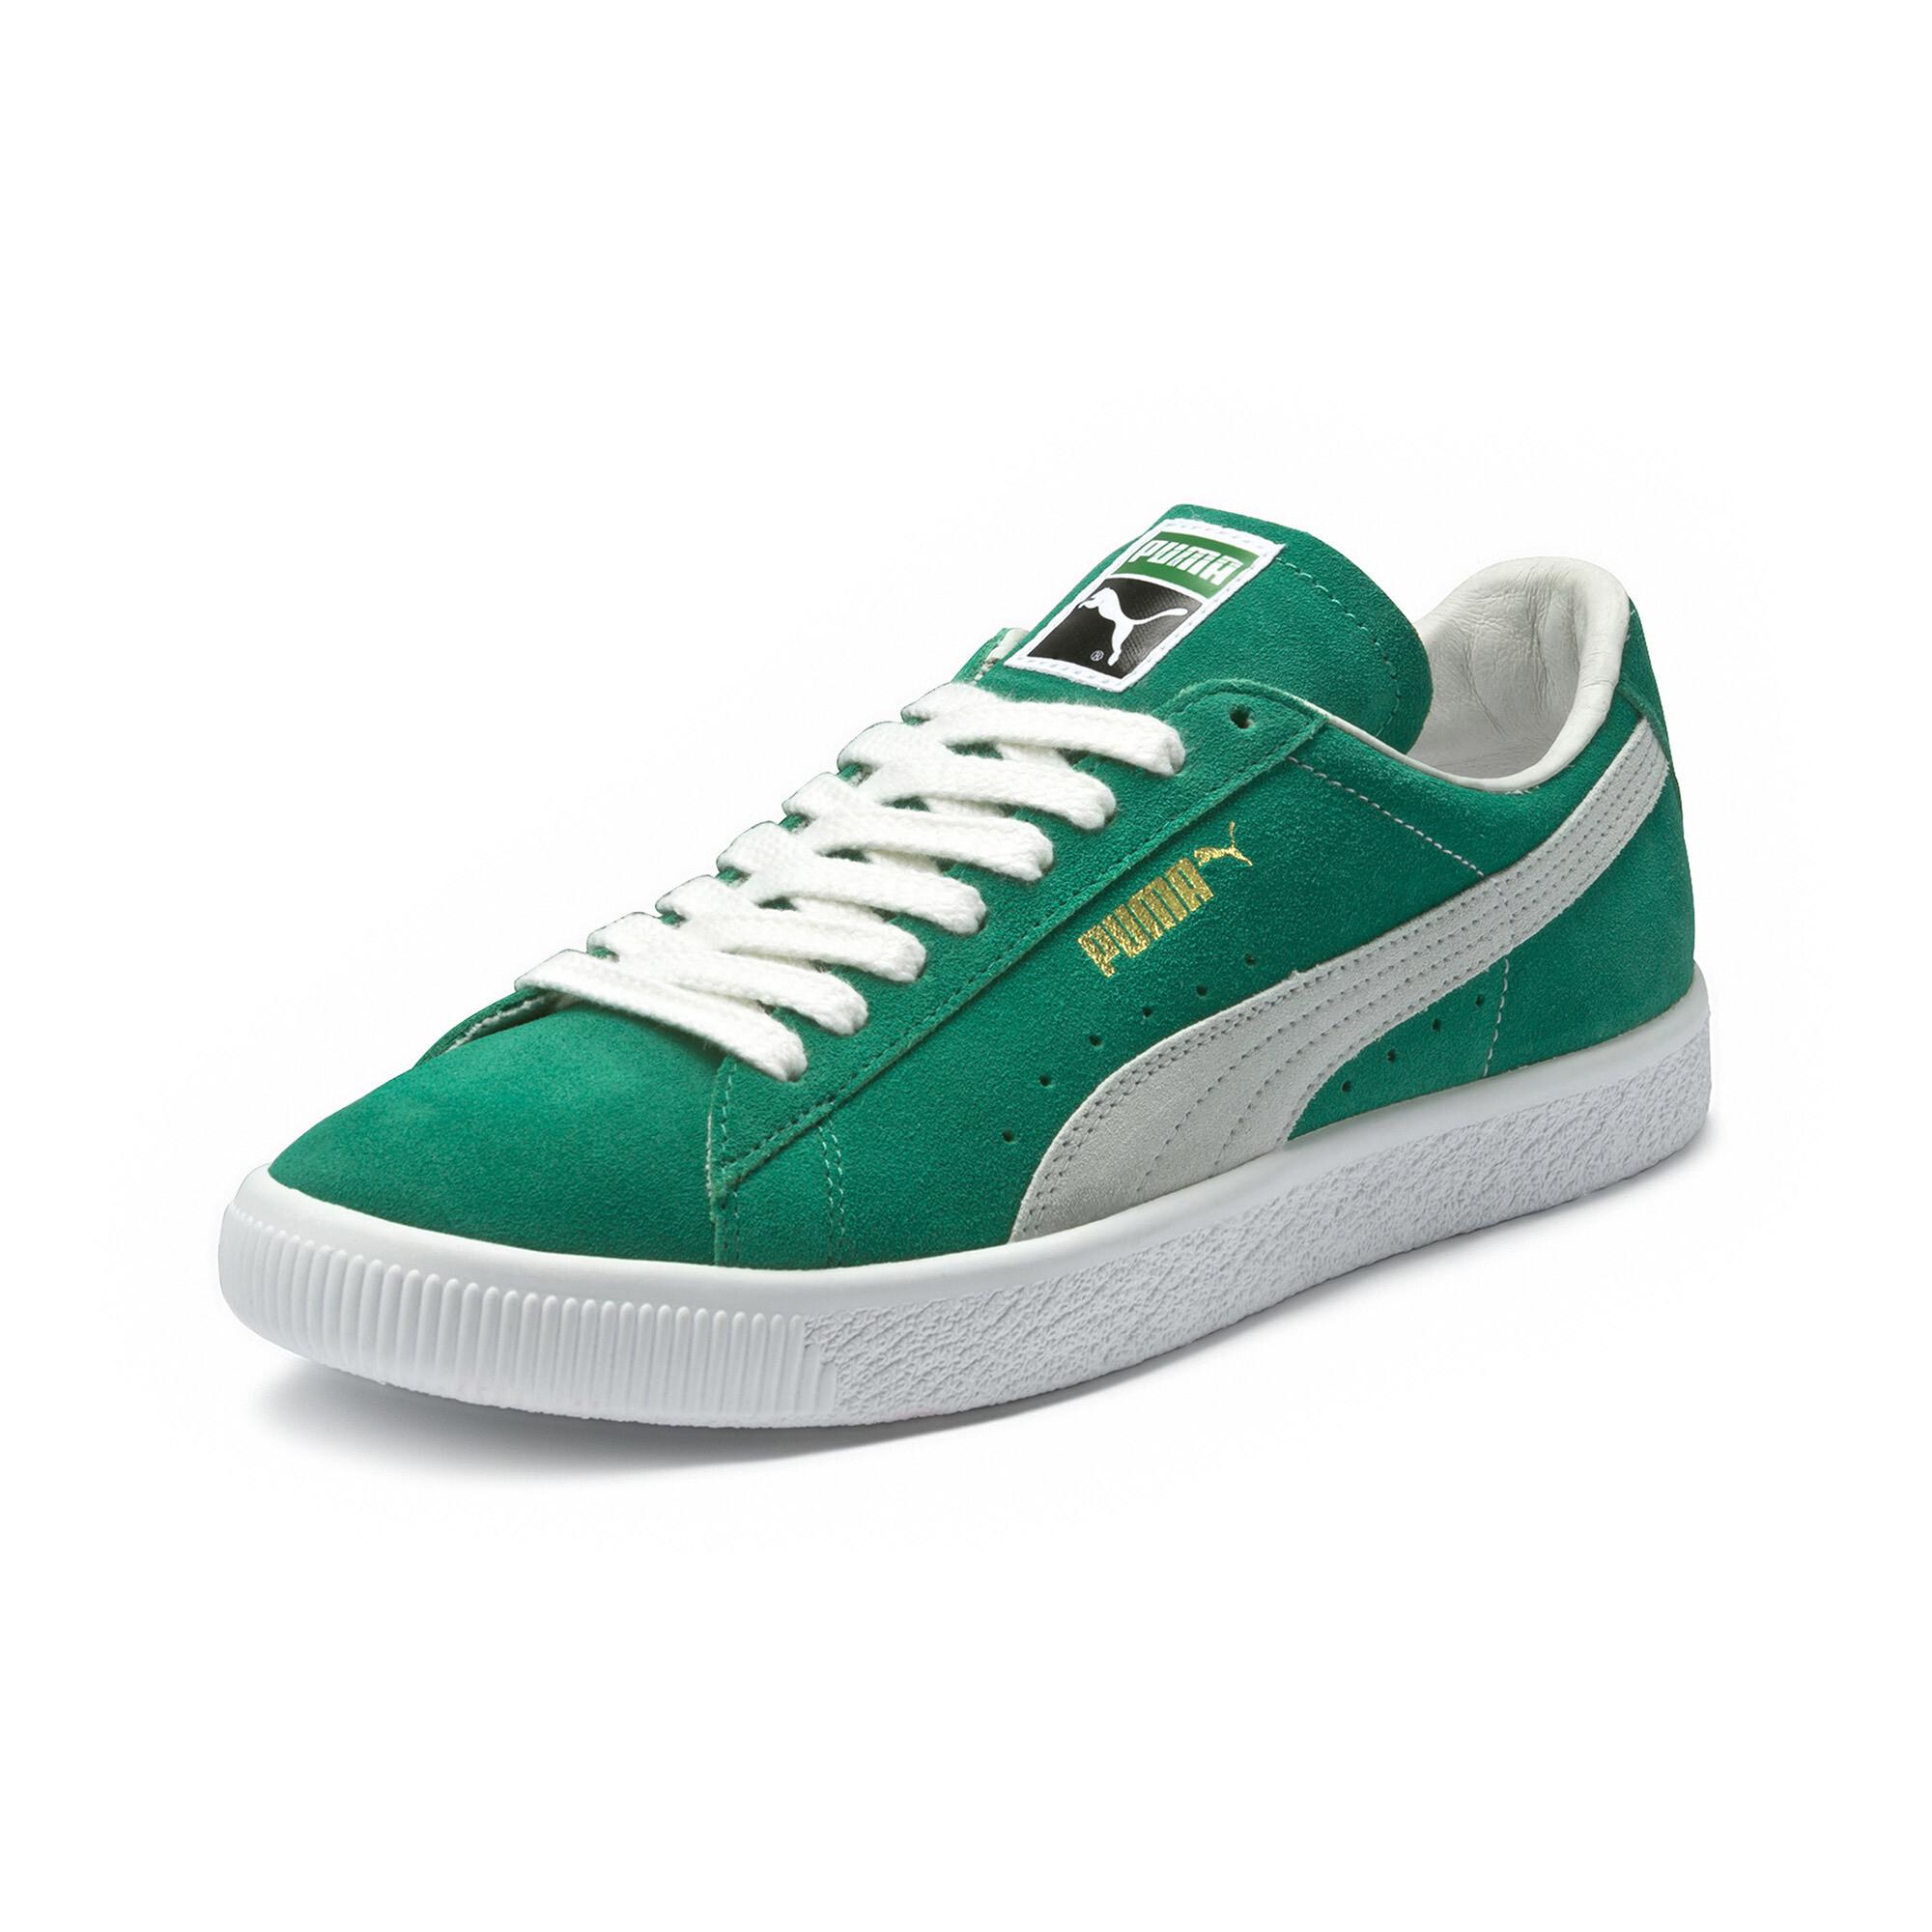 Image Puma Suede 90681 Sneakers #1